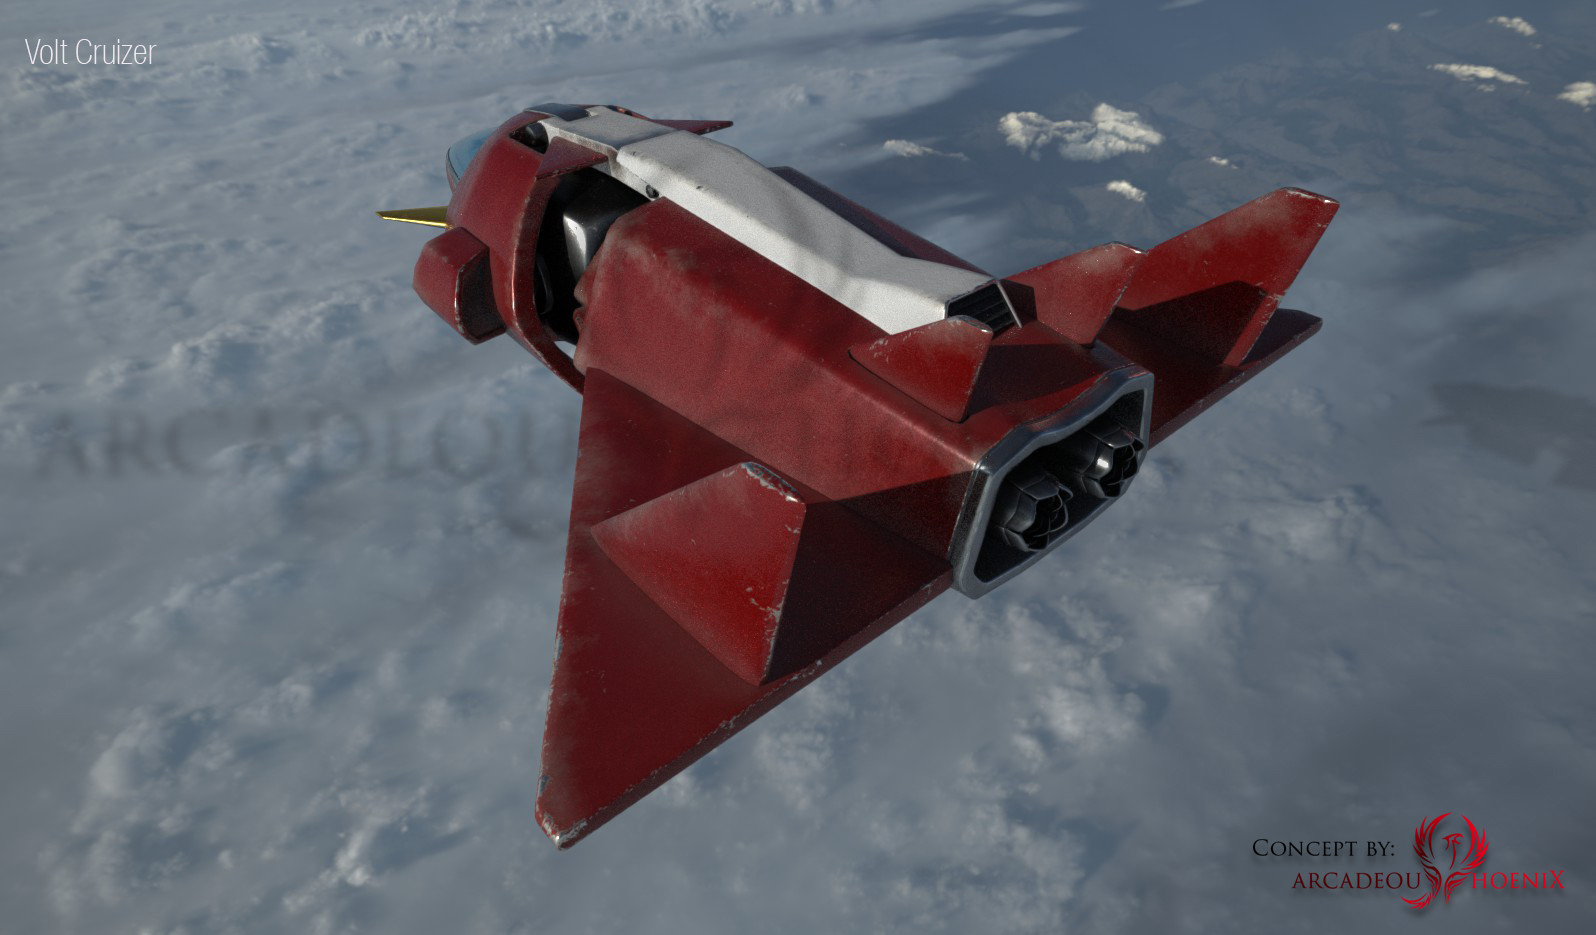 Arcadeous phoenix volt cruiser cam3